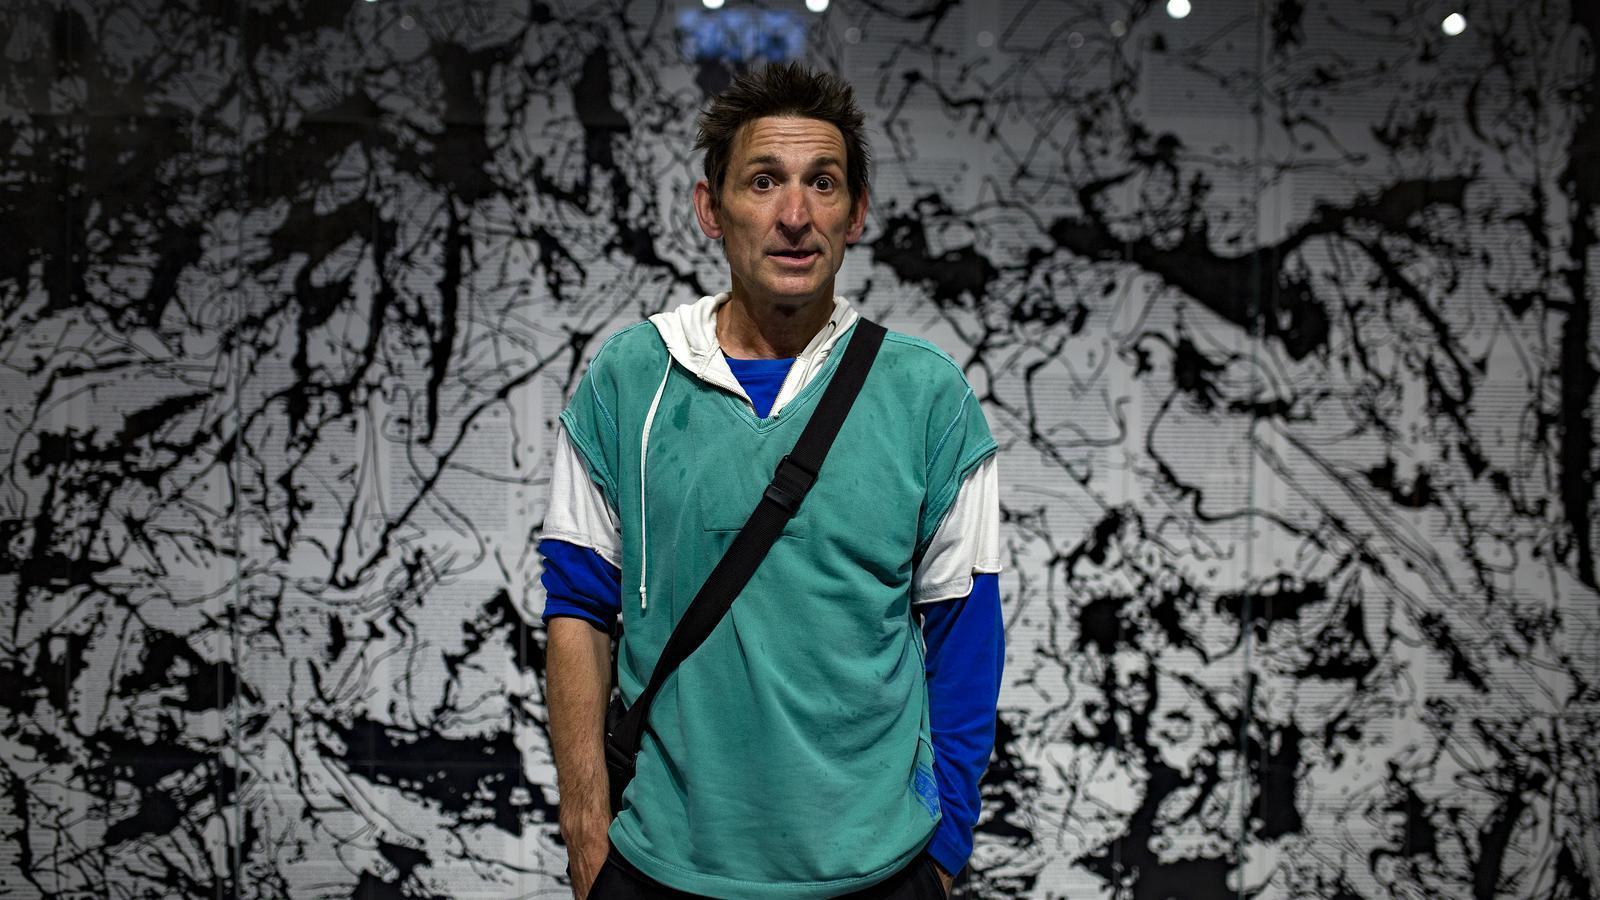 Albert Pla davant l'obra d'Art & Language 'Picasso's Guernica in the style of Jackson Pollock' a la llibreria Ona del carrer Pau Claris de Barcelona.